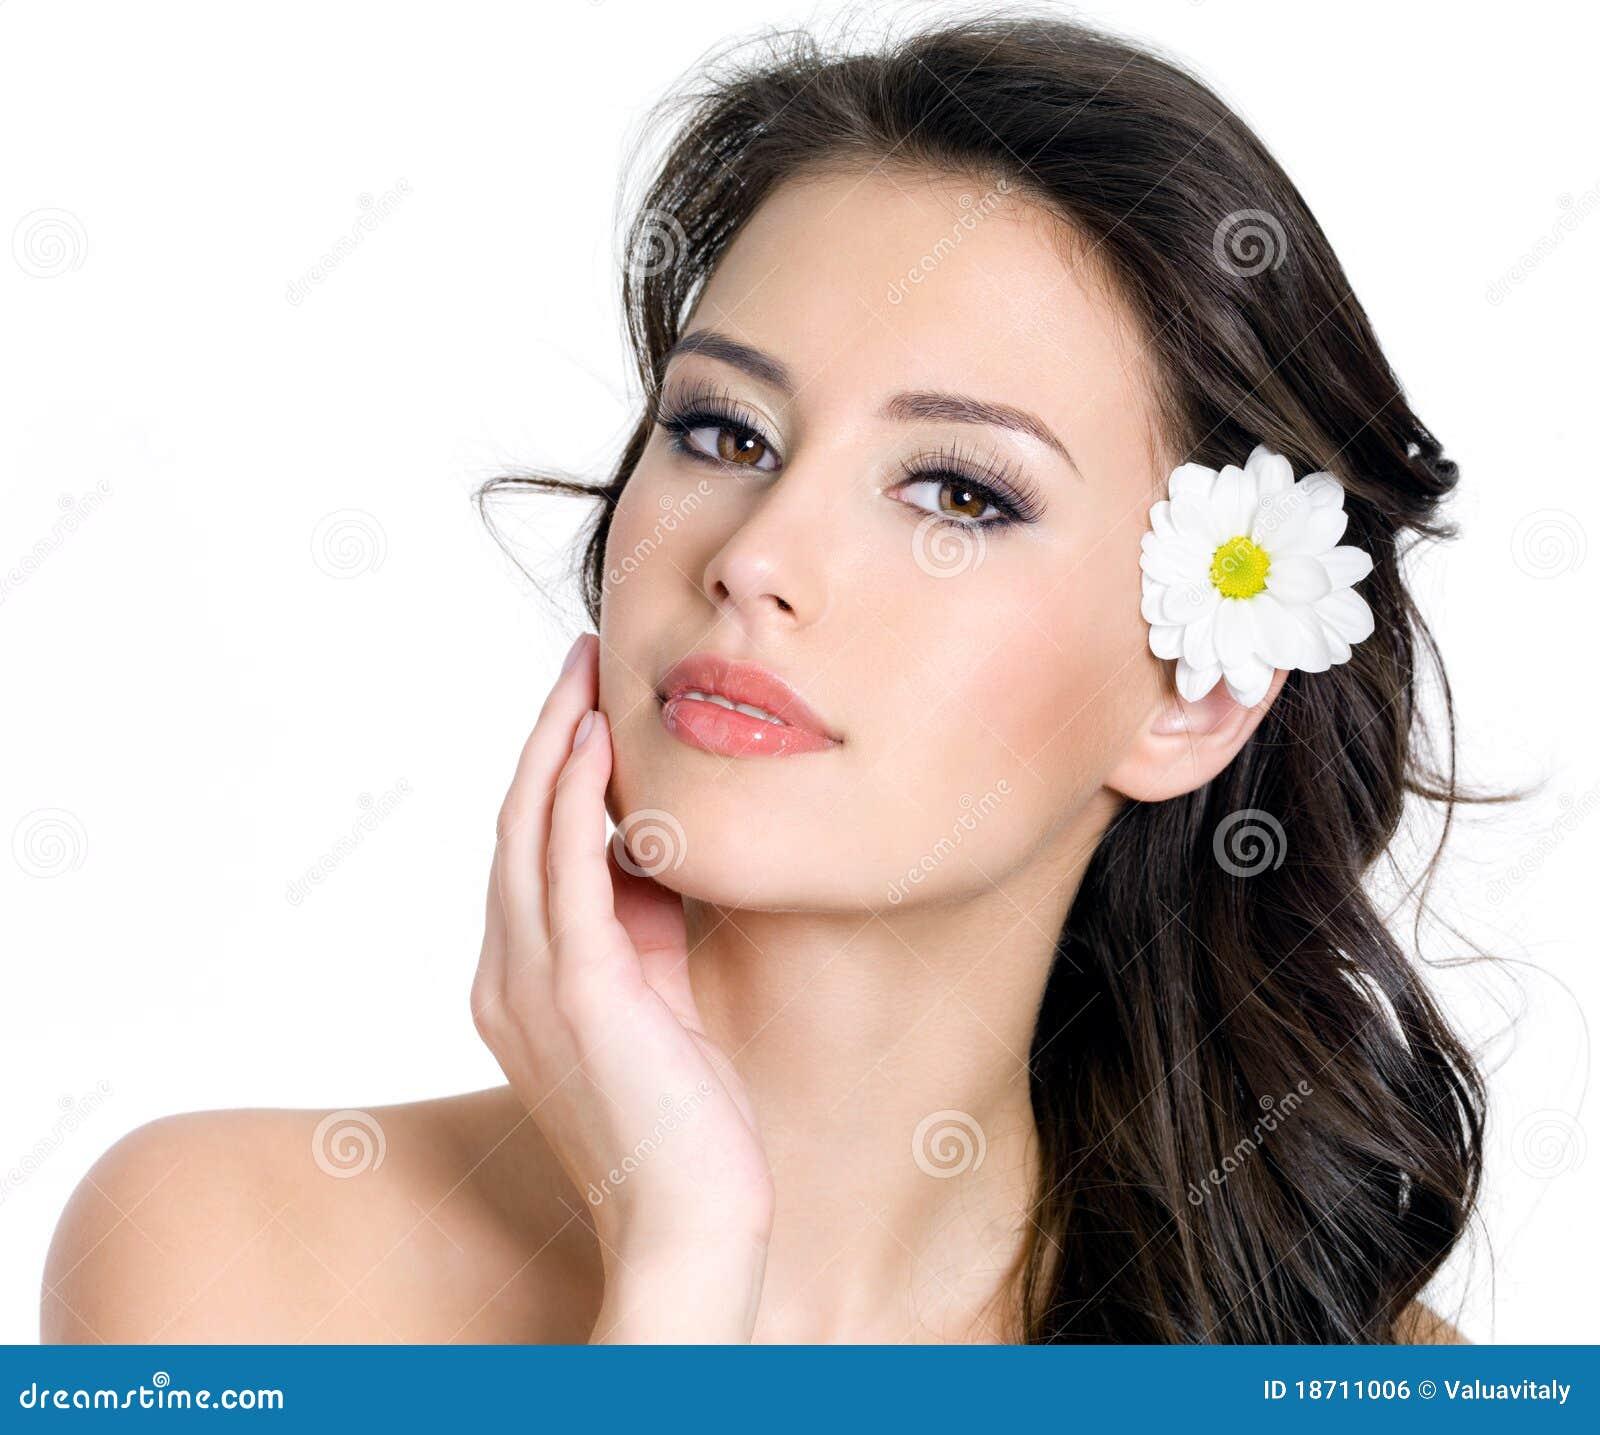 Flower in hair best flower 2017 80 spring summer wedding hairstyles with flowers femaline izmirmasajfo Image collections